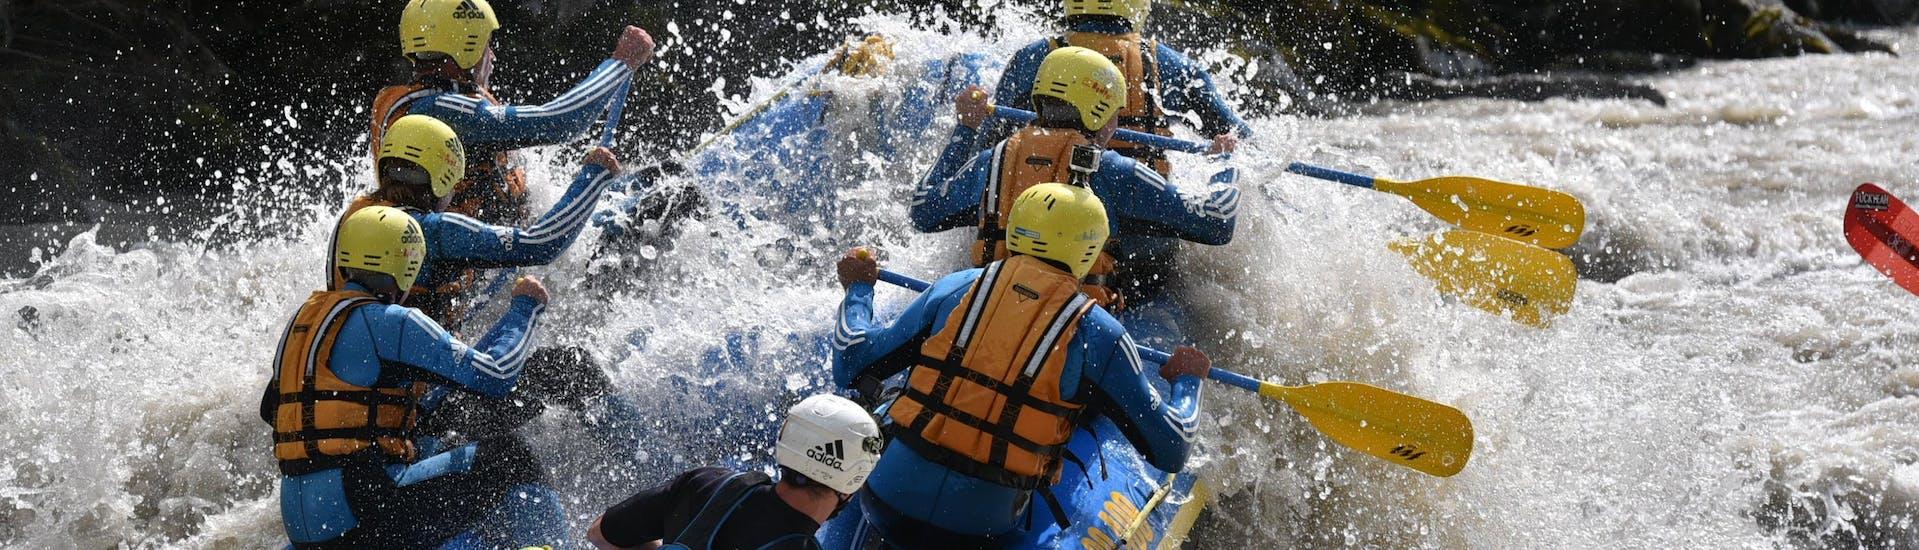 rafting-for-explorers---imster-schlucht-faszinatour-hero